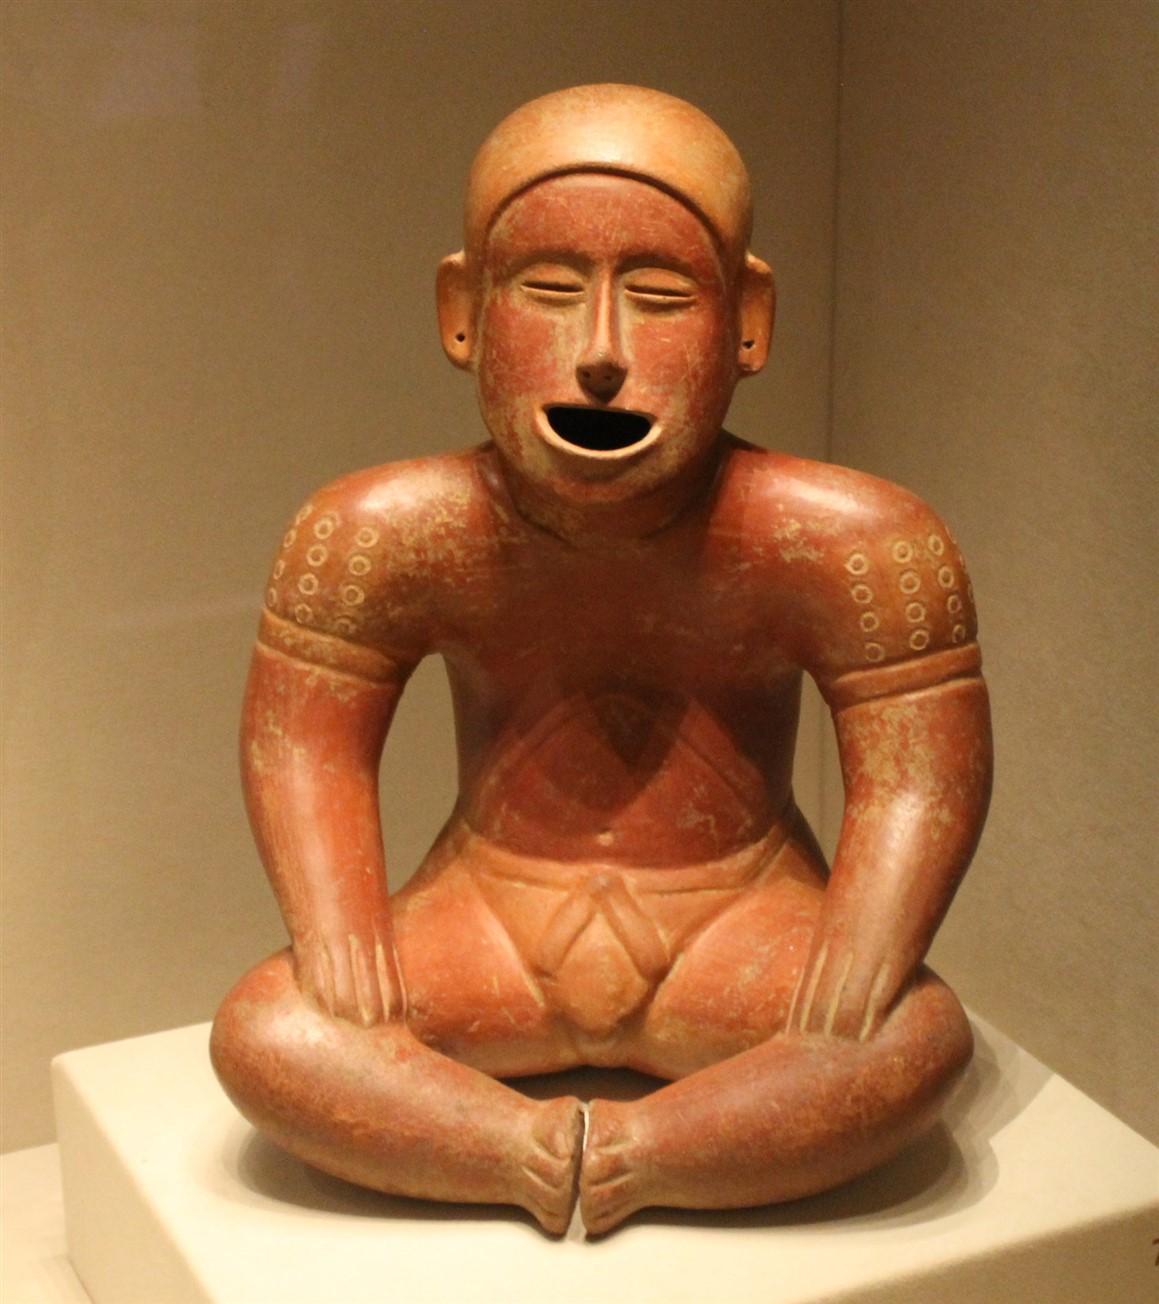 2015 07 18 364 Indianapolis Museum of Art